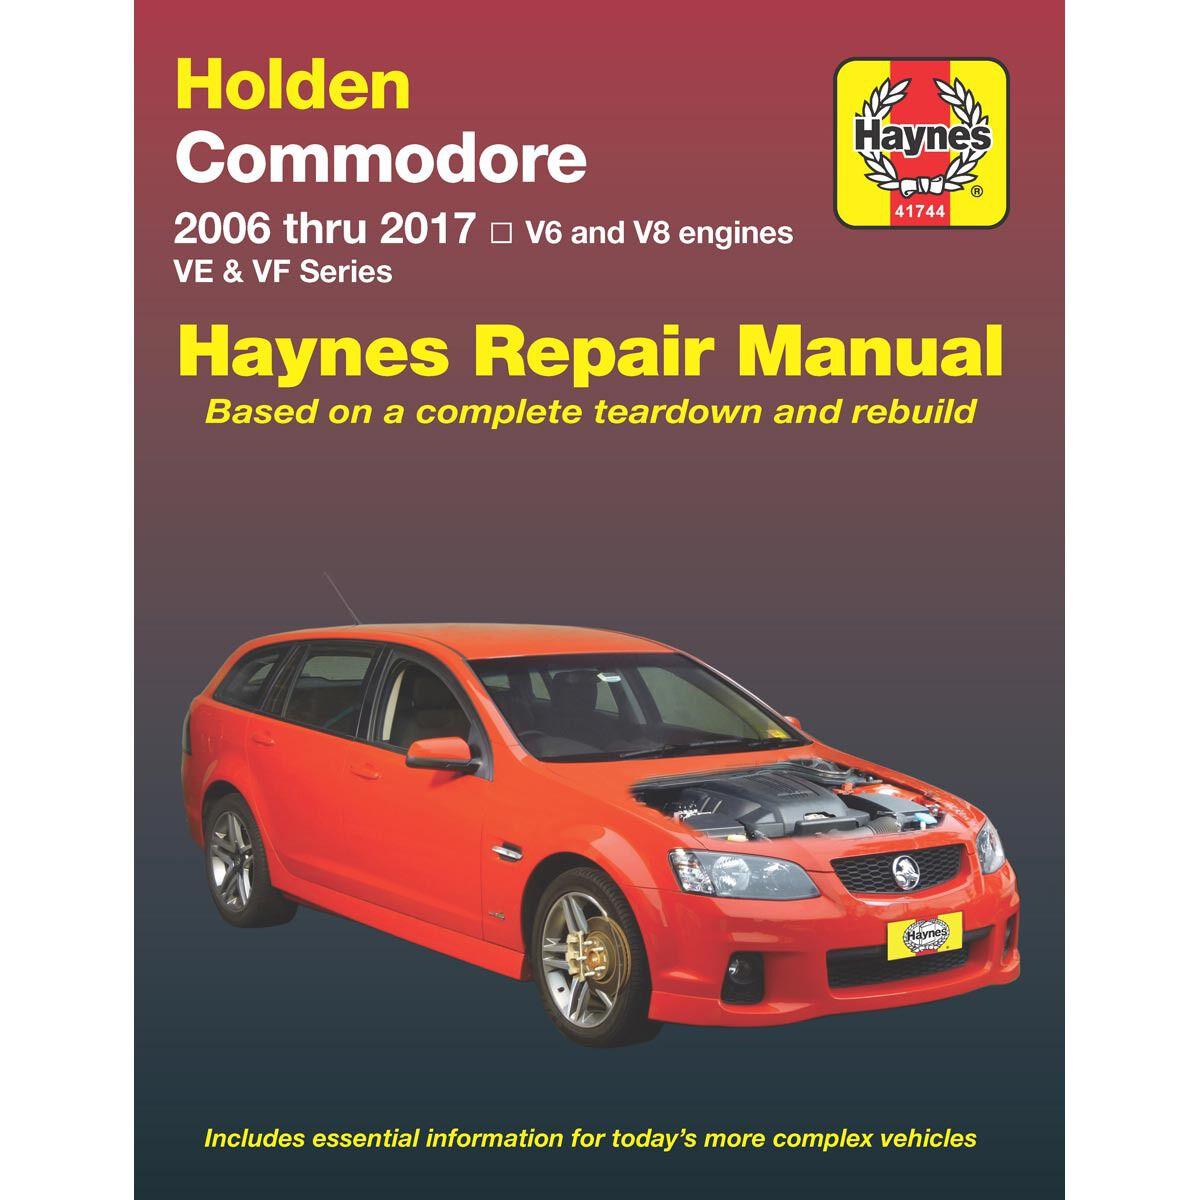 haynes car manual for holden commodore ve vf 2006 2017 41744 rh supercheapauto com au